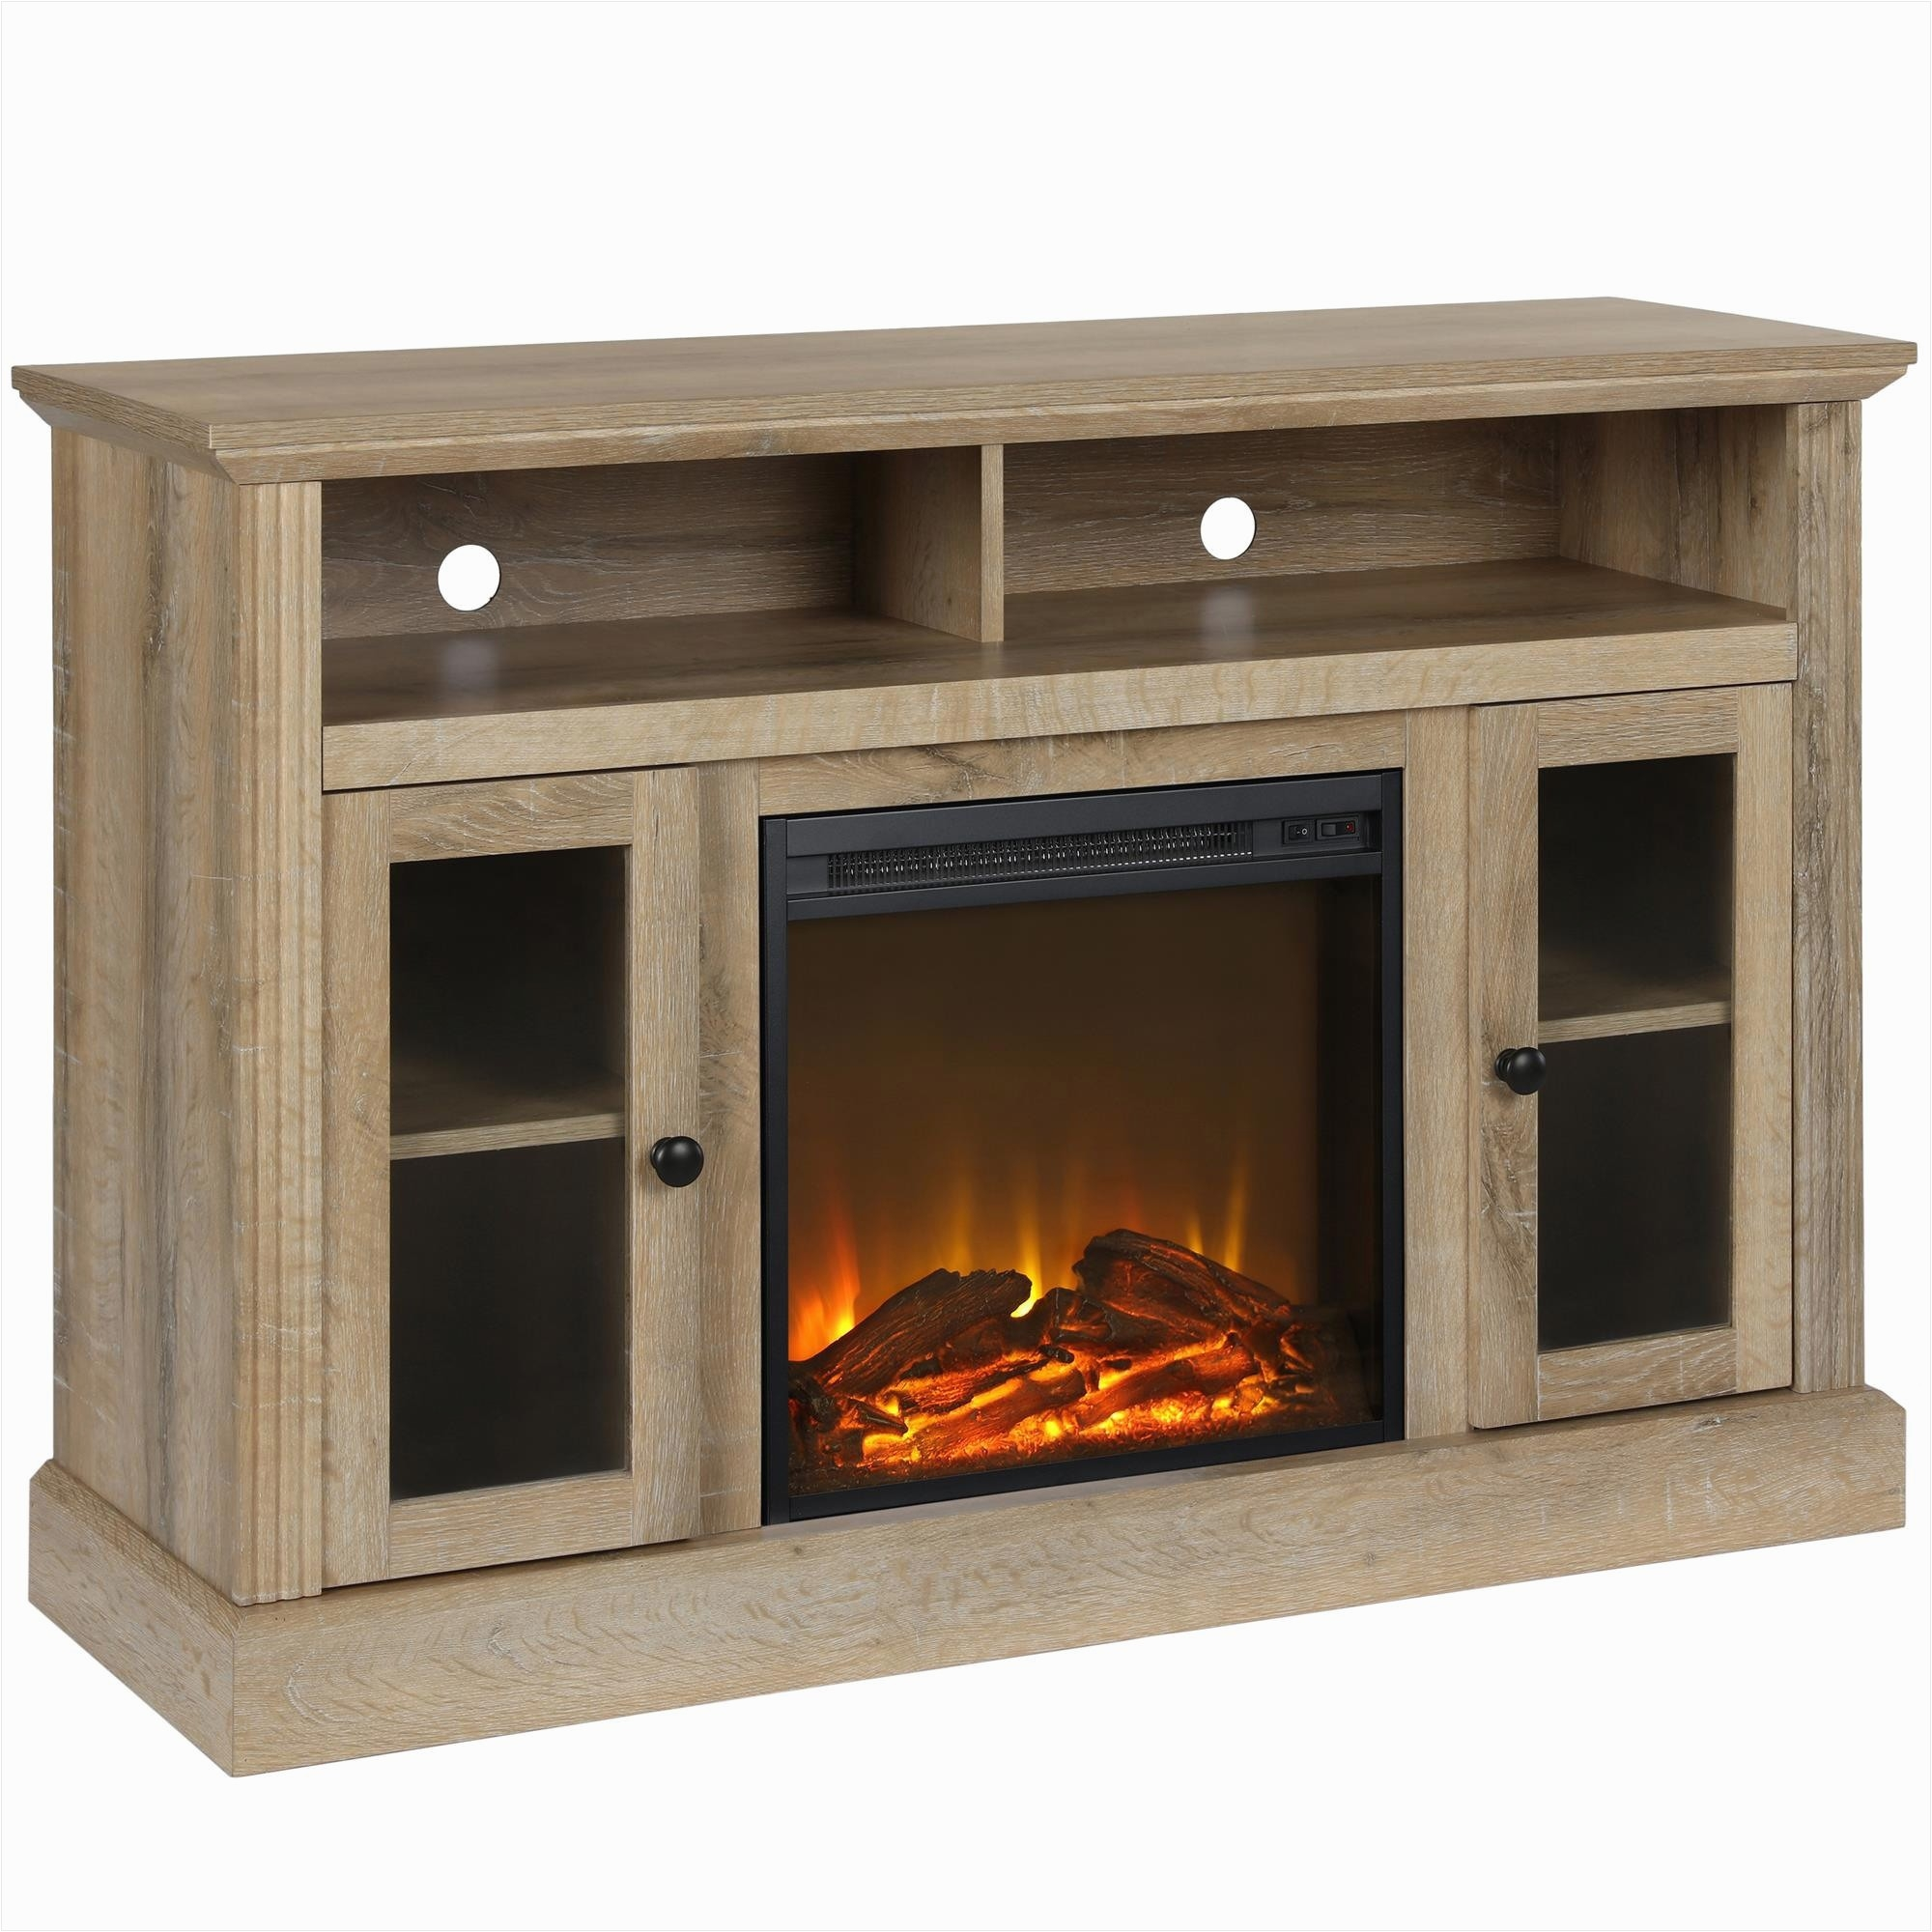 white mantel gas fireplace cheap fireplace mantels simplistic ideas improvementara of white mantel gas fireplace